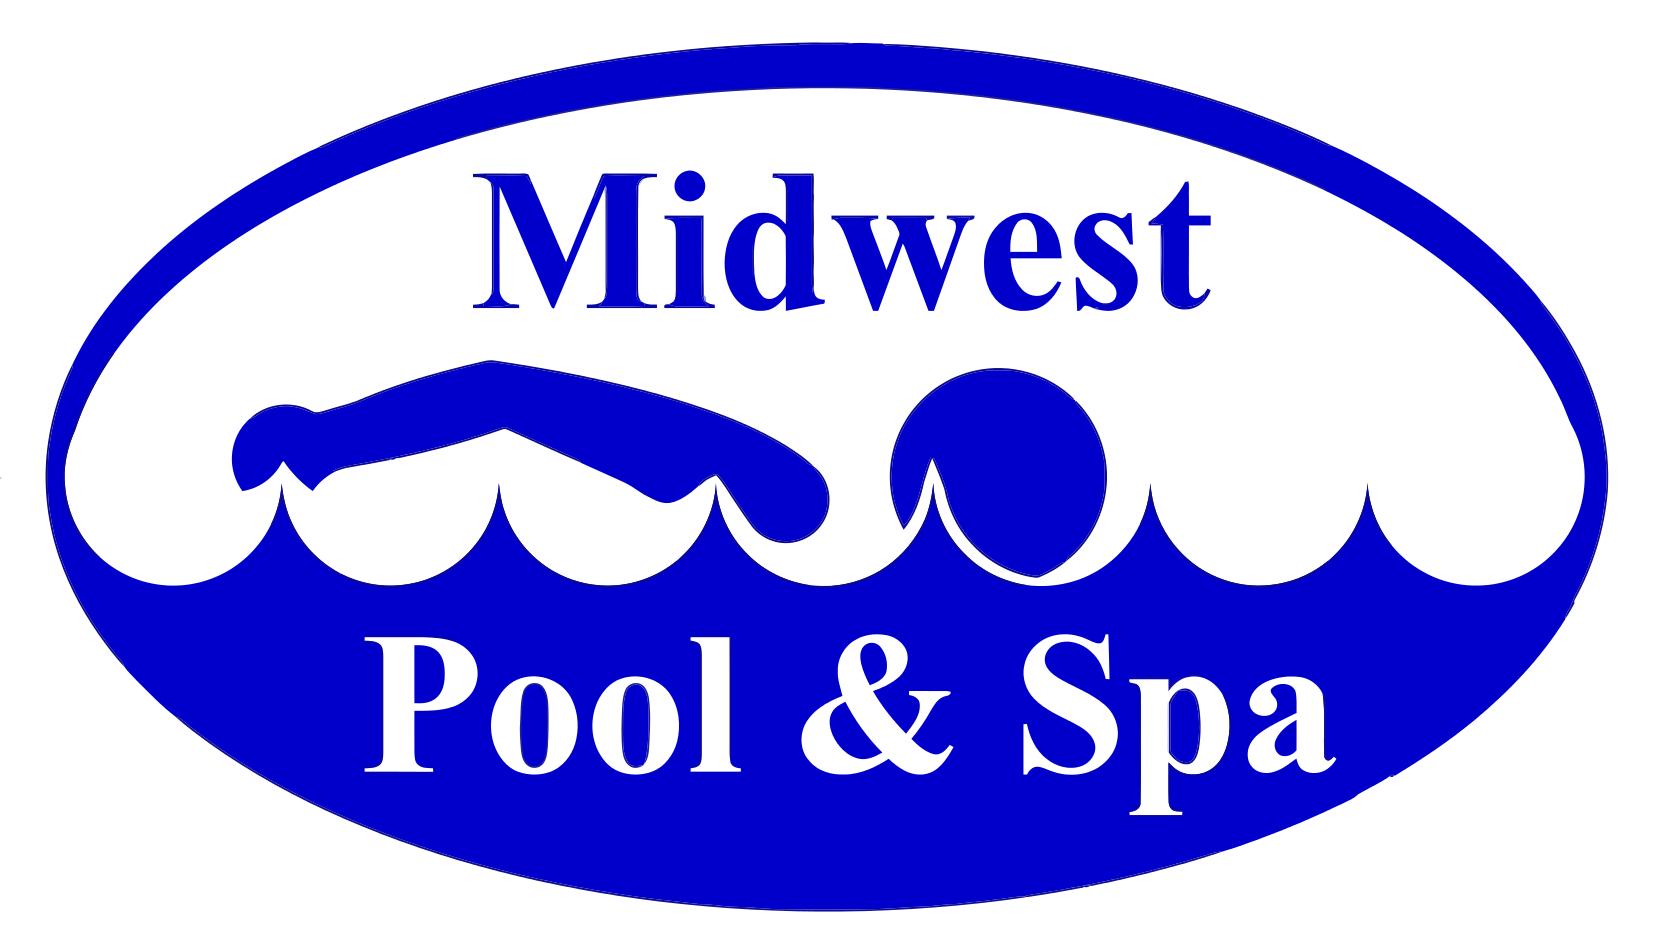 MIdwest Pool & Spa